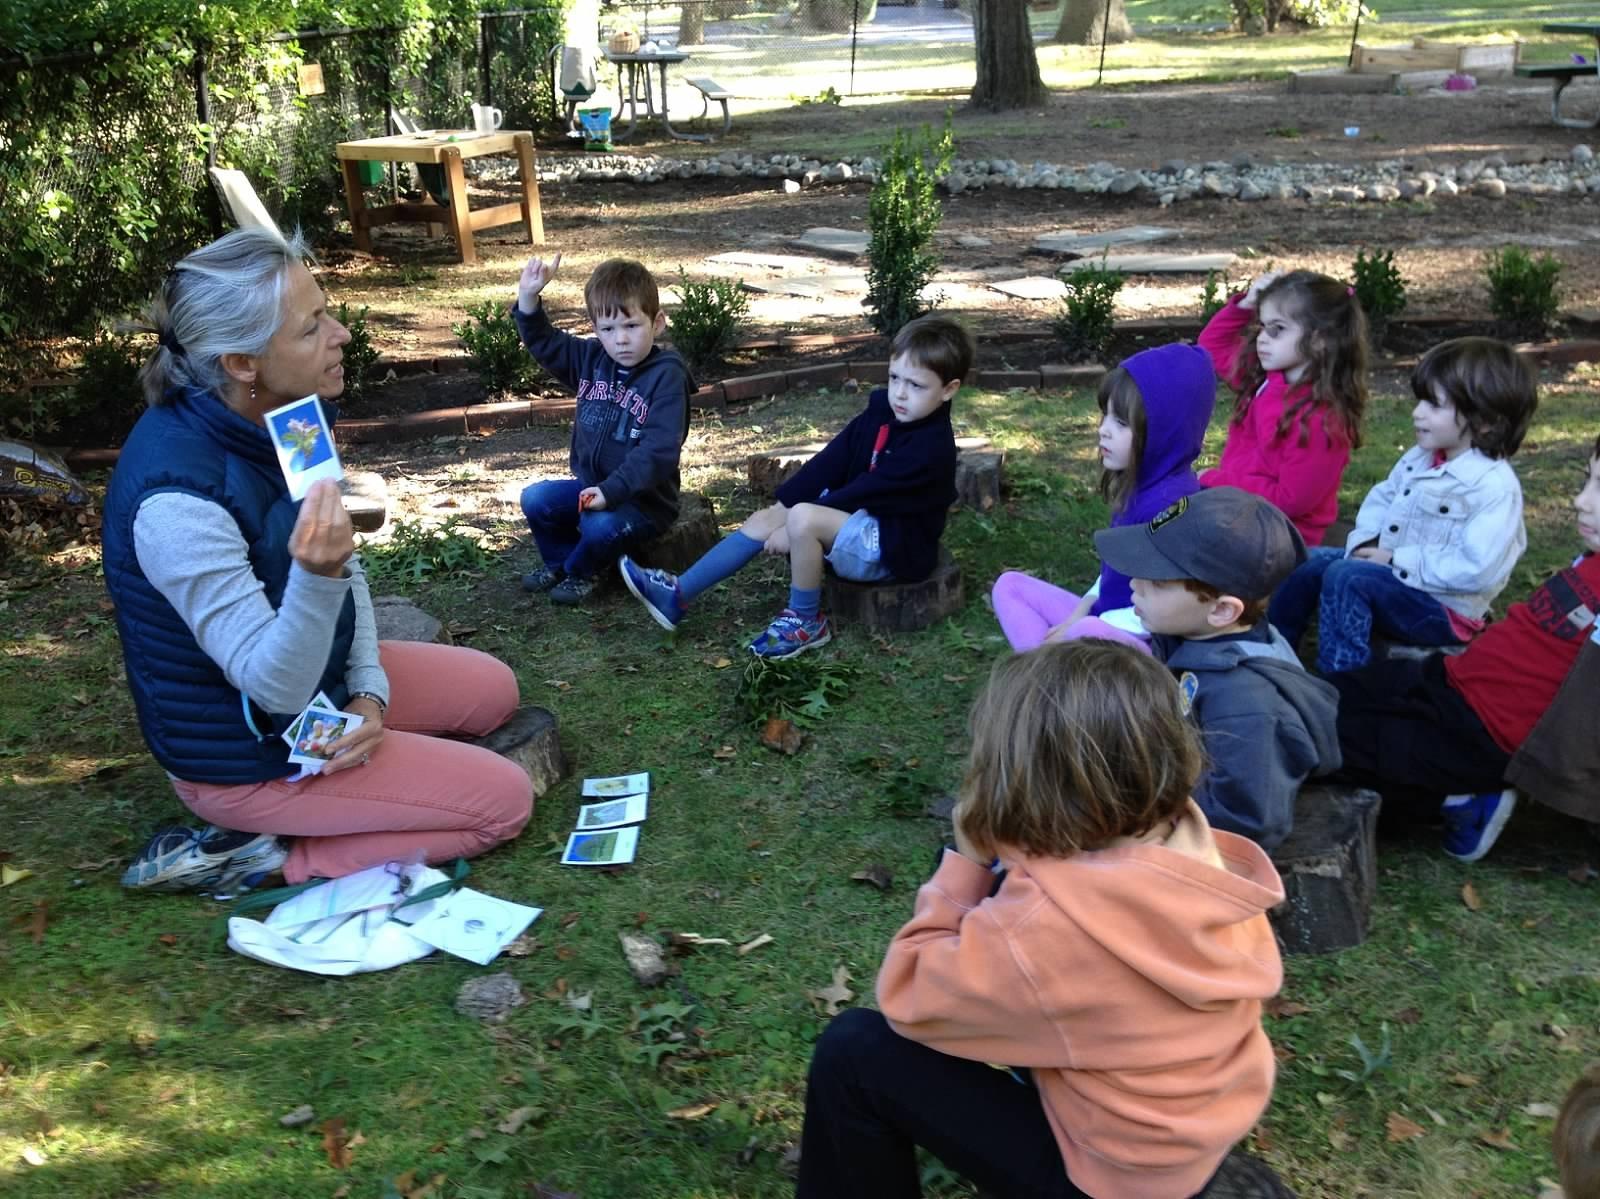 6aec9816d0d6bb279507_Outdoor_Classroom_TSTI_Preschoolers_Learning.jpg